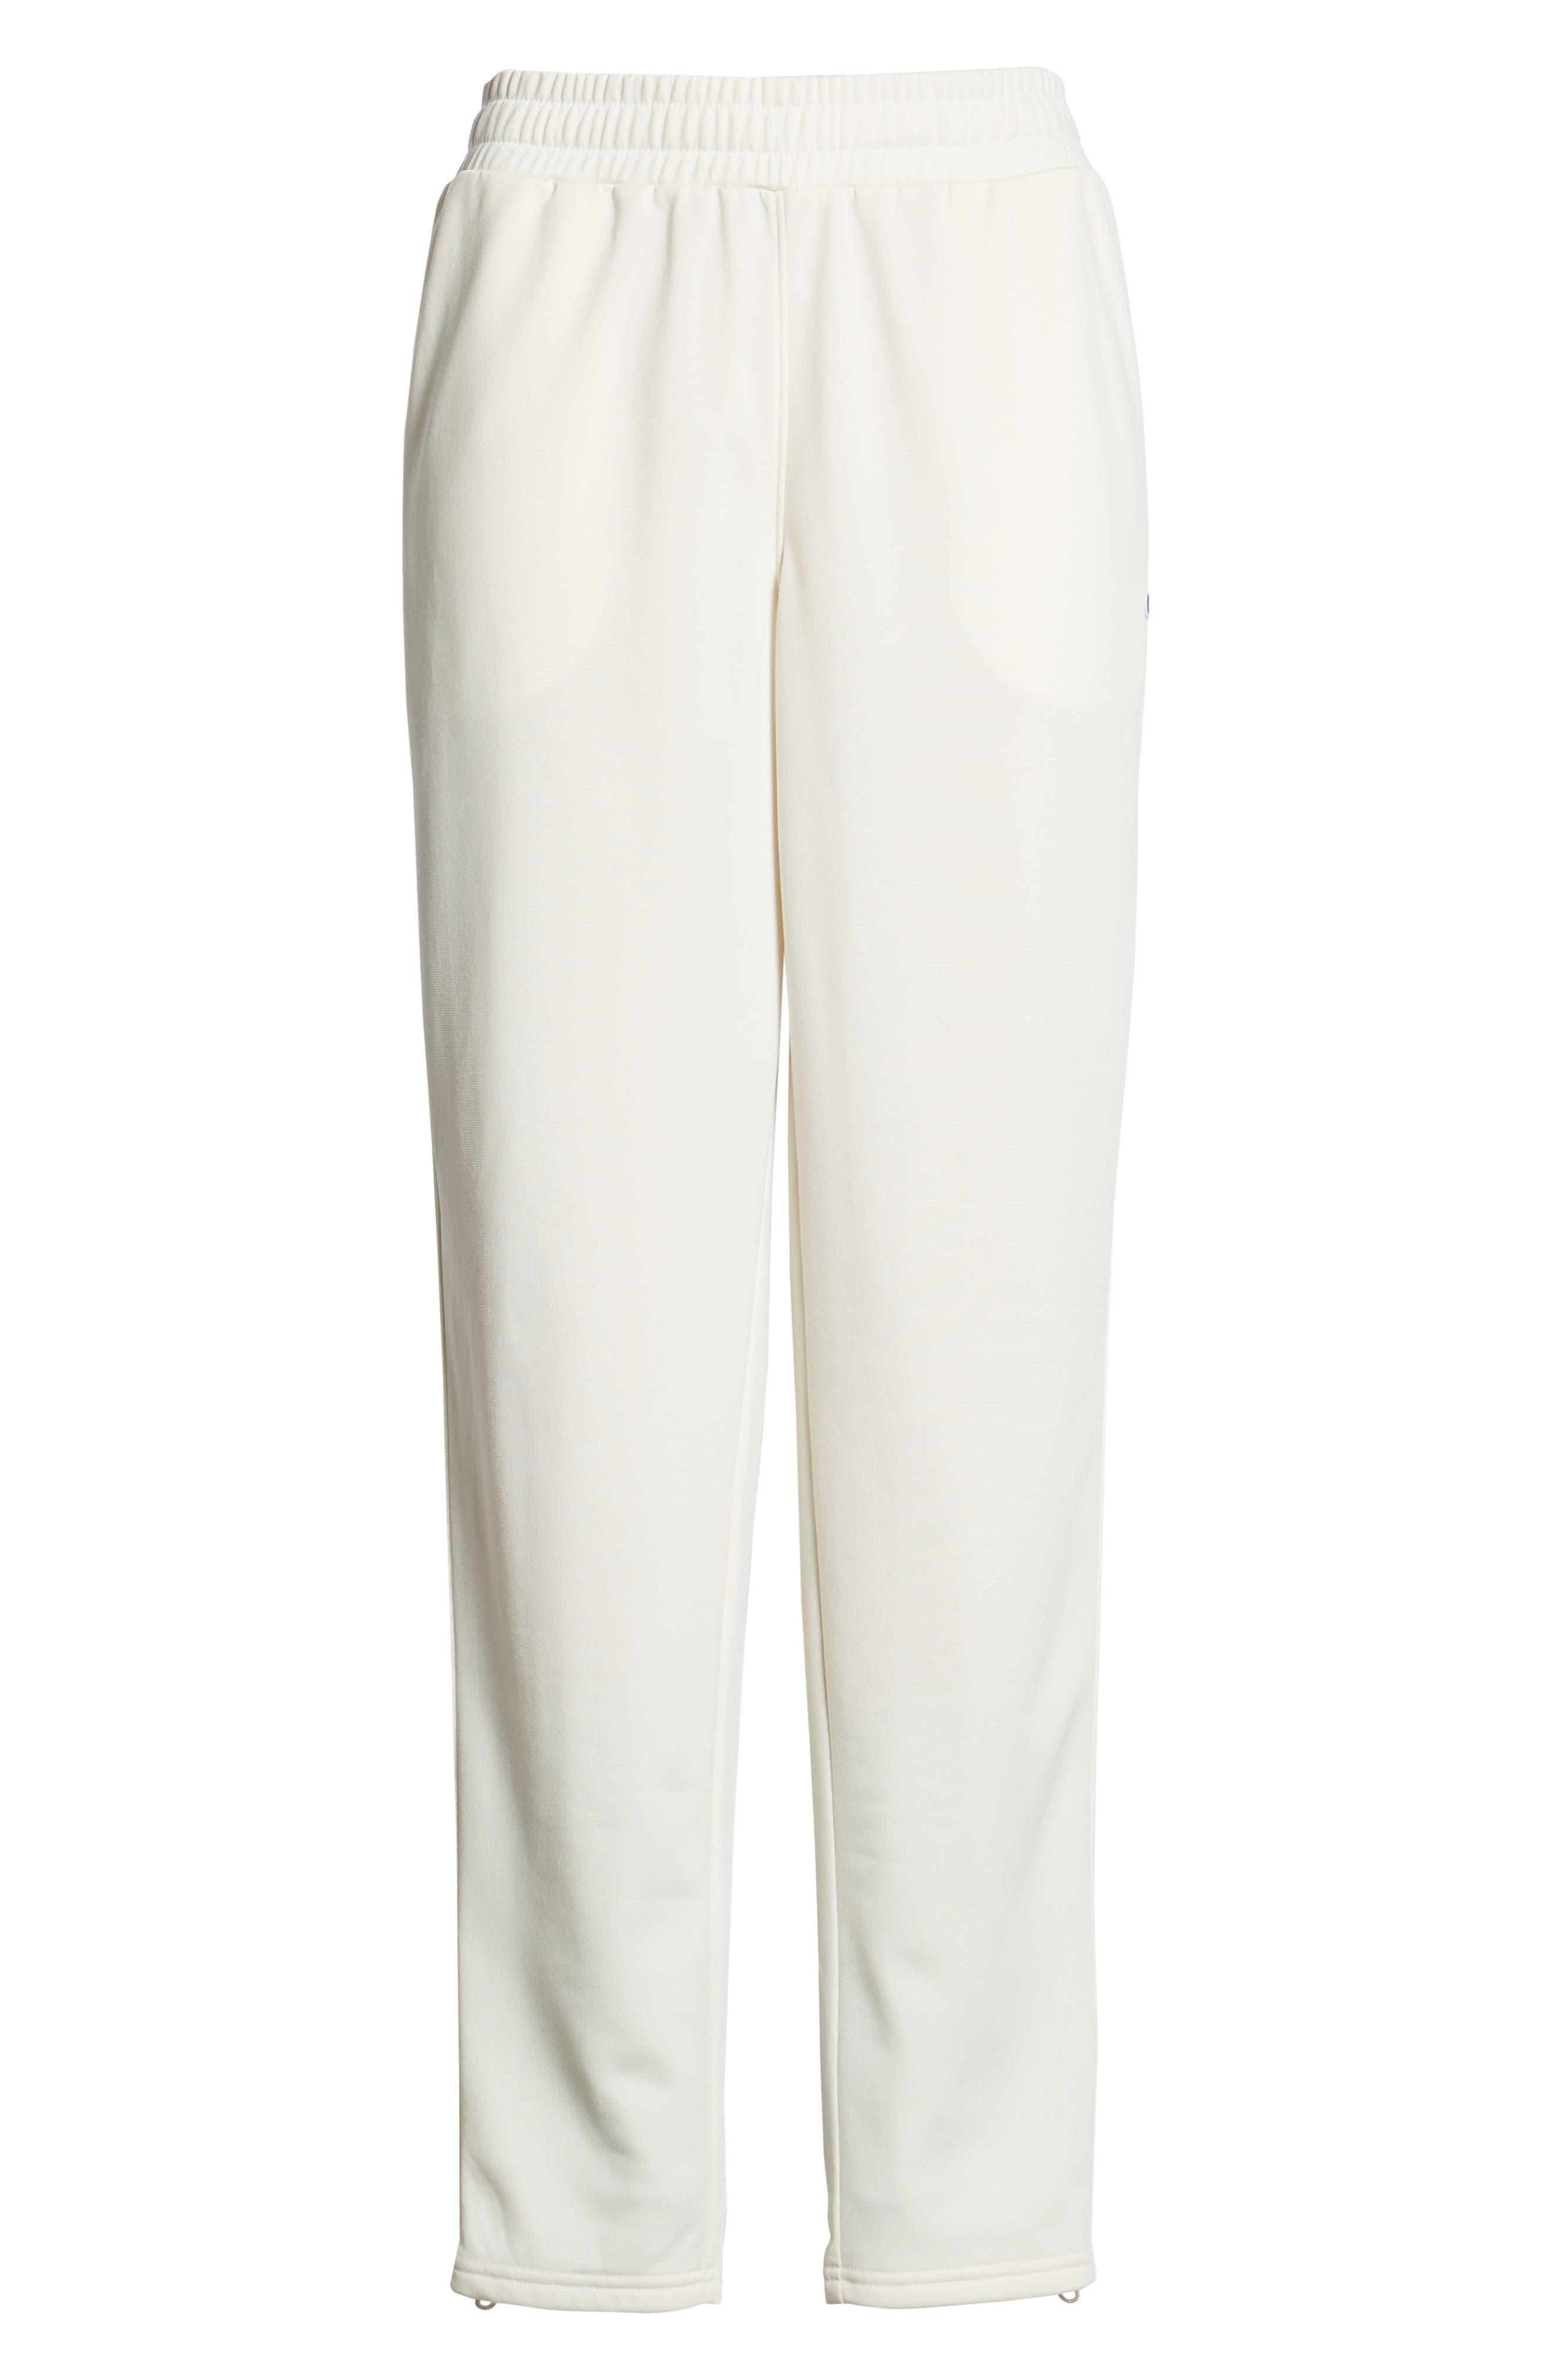 CHAMPION, Side Stripe Track Pants, Alternate thumbnail 7, color, CHALK WHITE